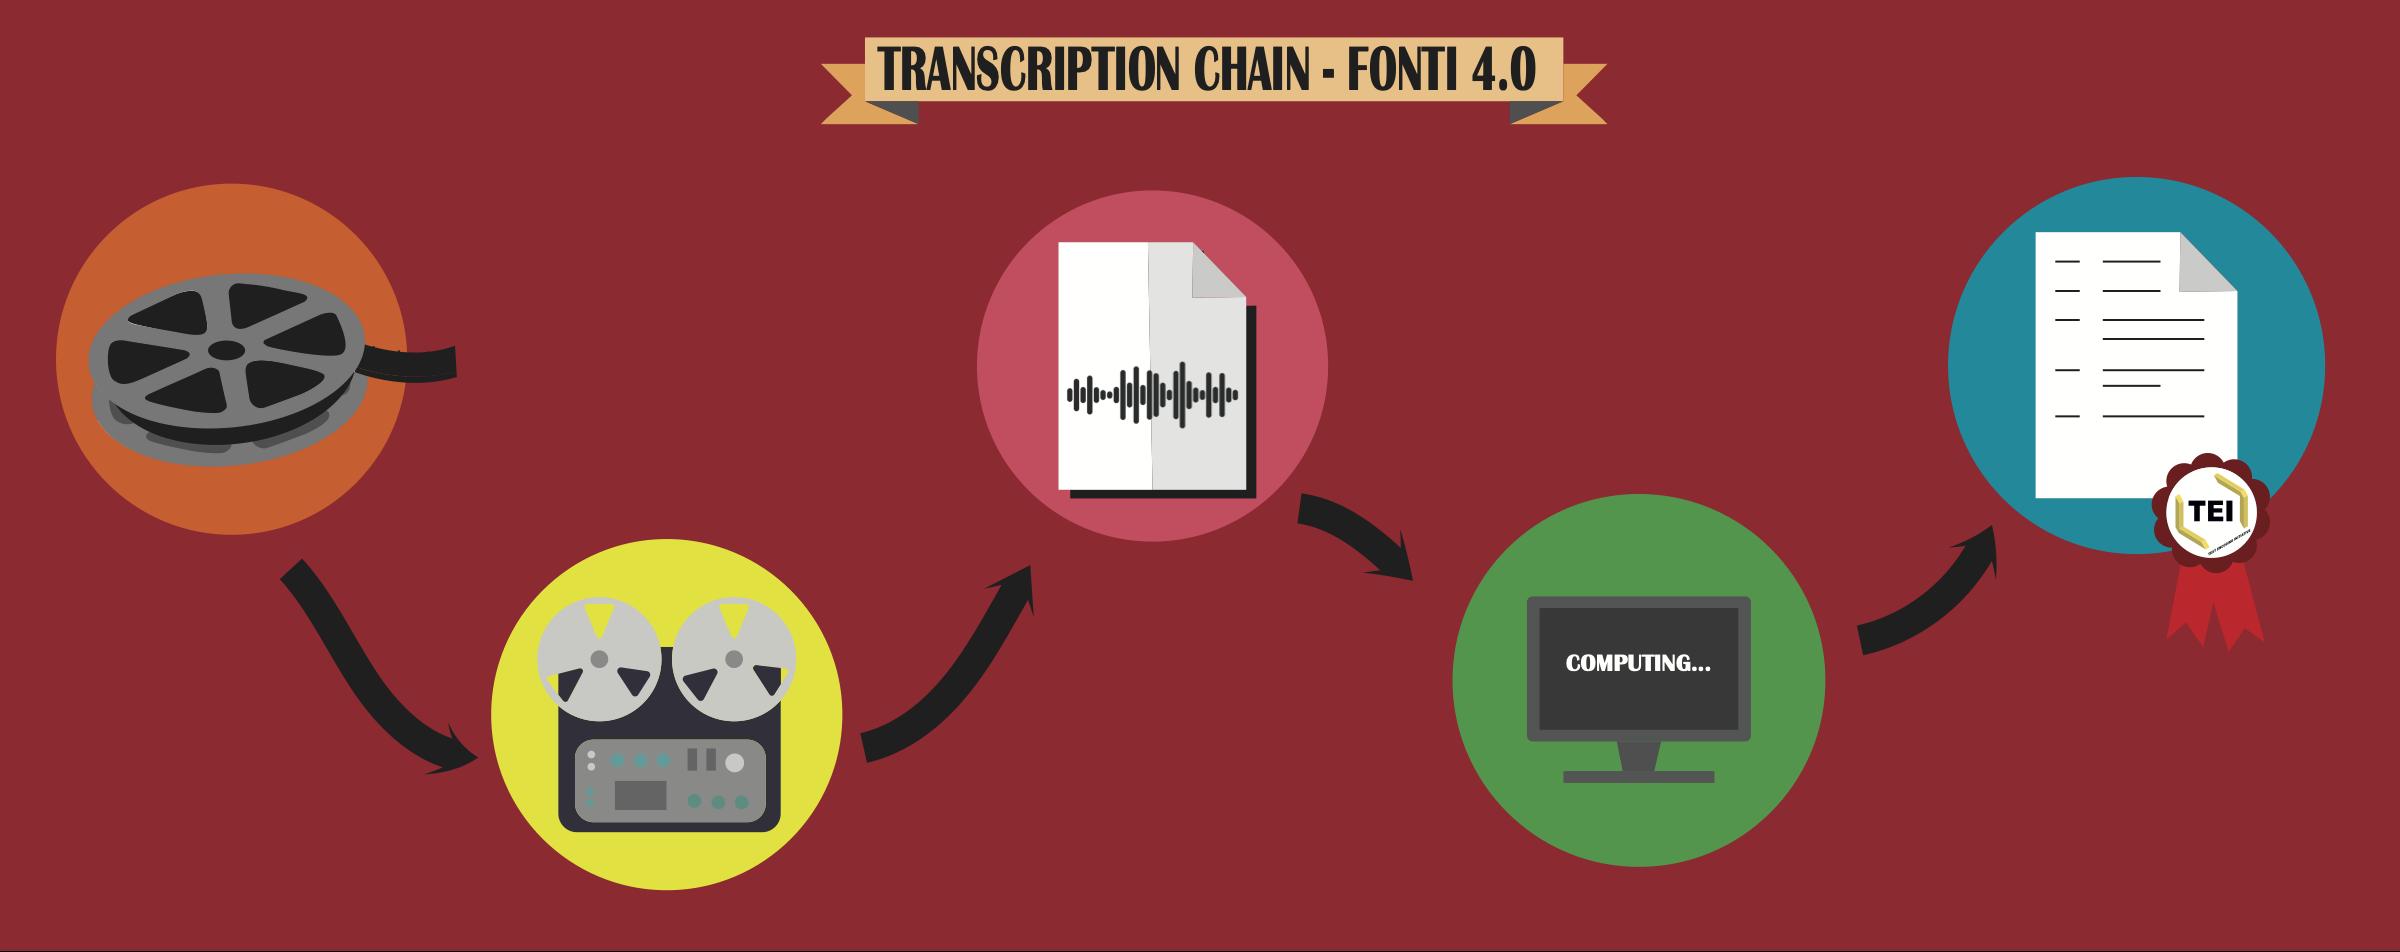 Transcription Chain